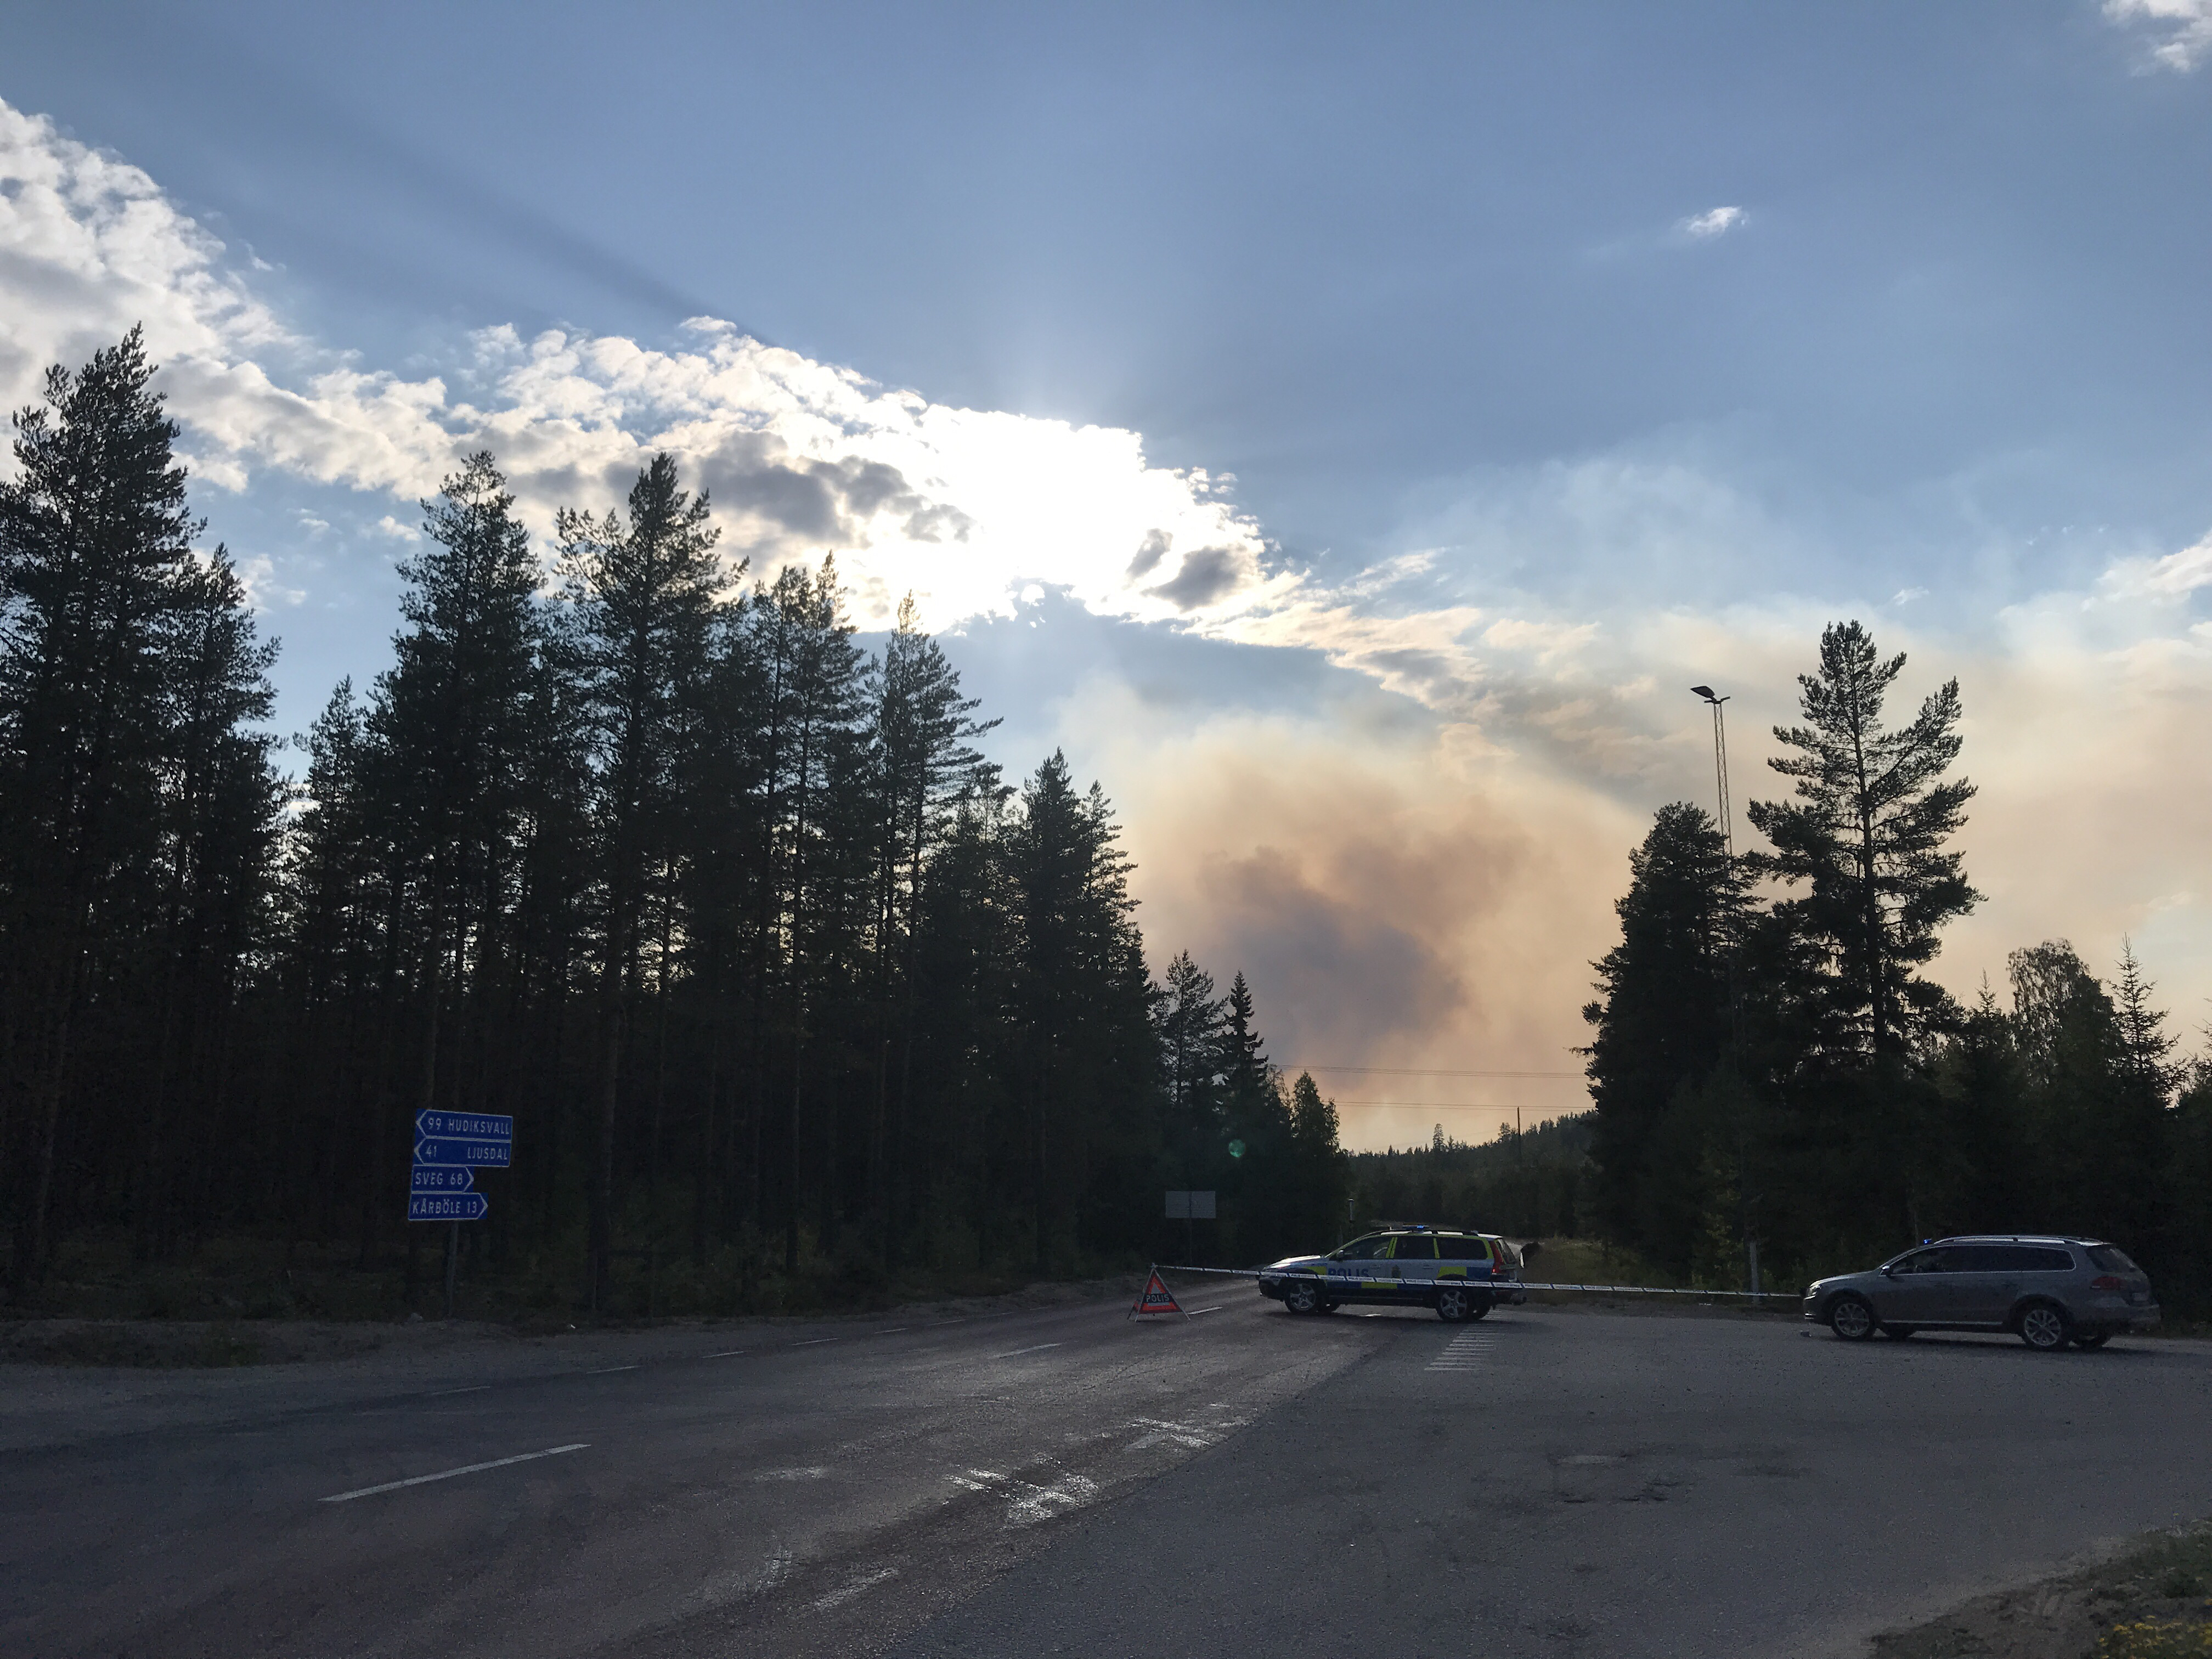 72 000 evakuerades efter brand